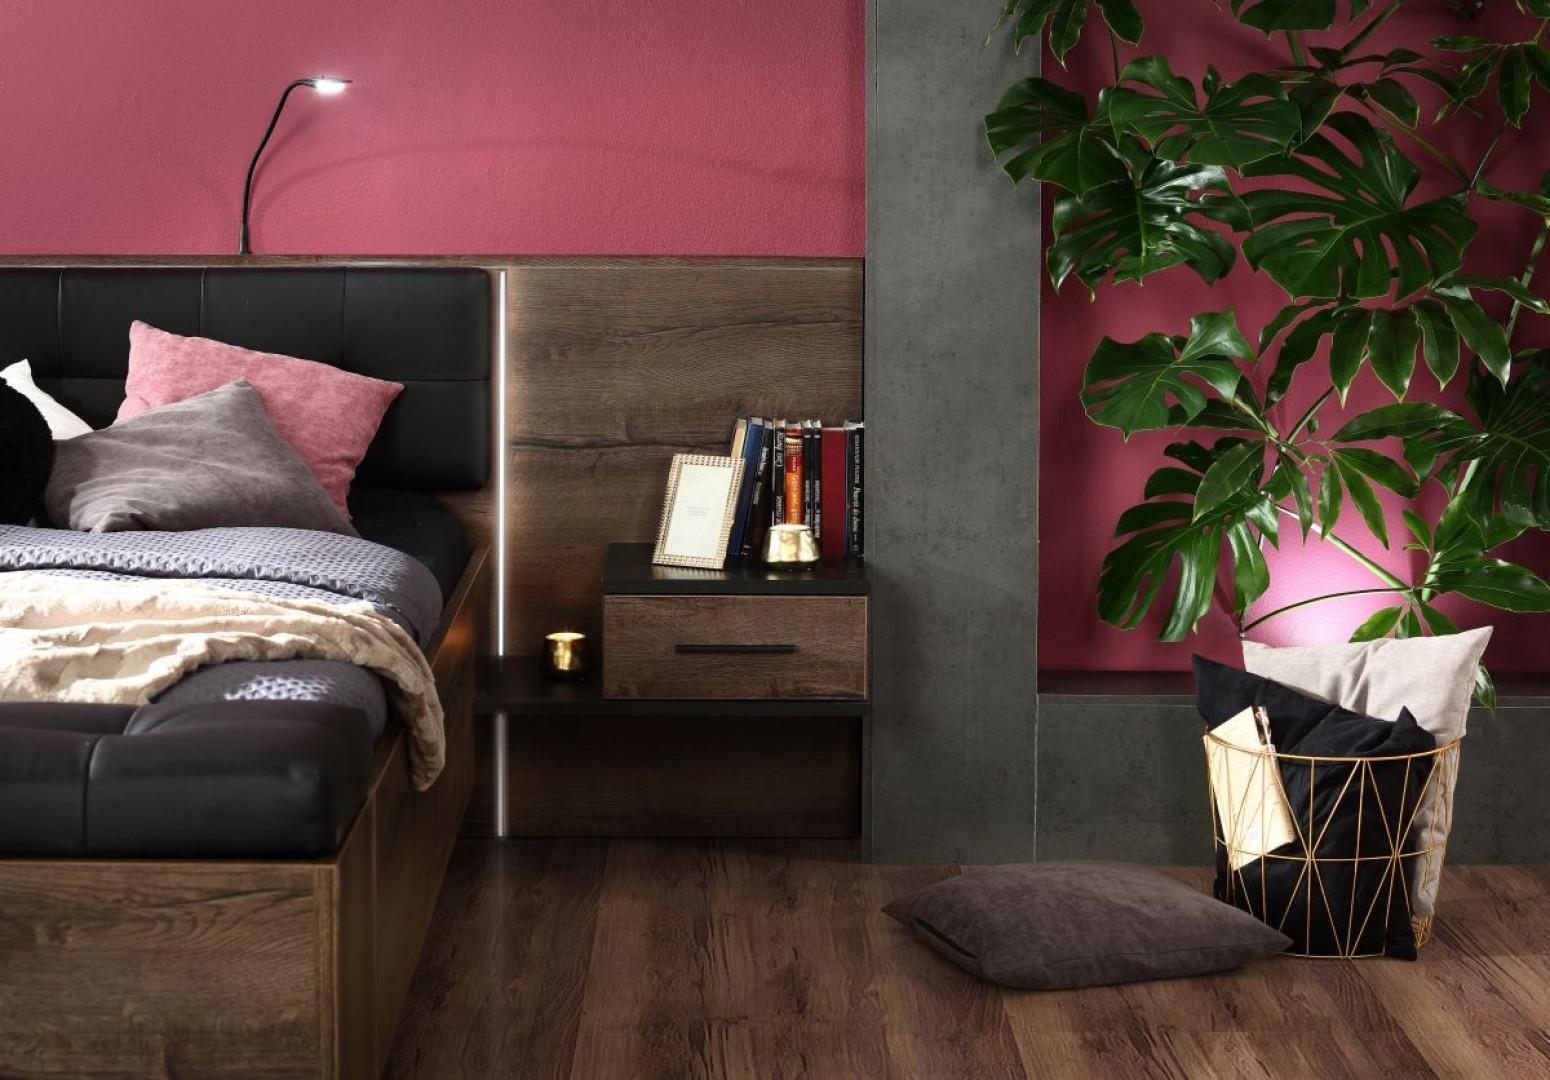 Szafka nocna zintegrowana z łóżkiem – kolekcja Bellevue firmy Forte. Fot. Forte